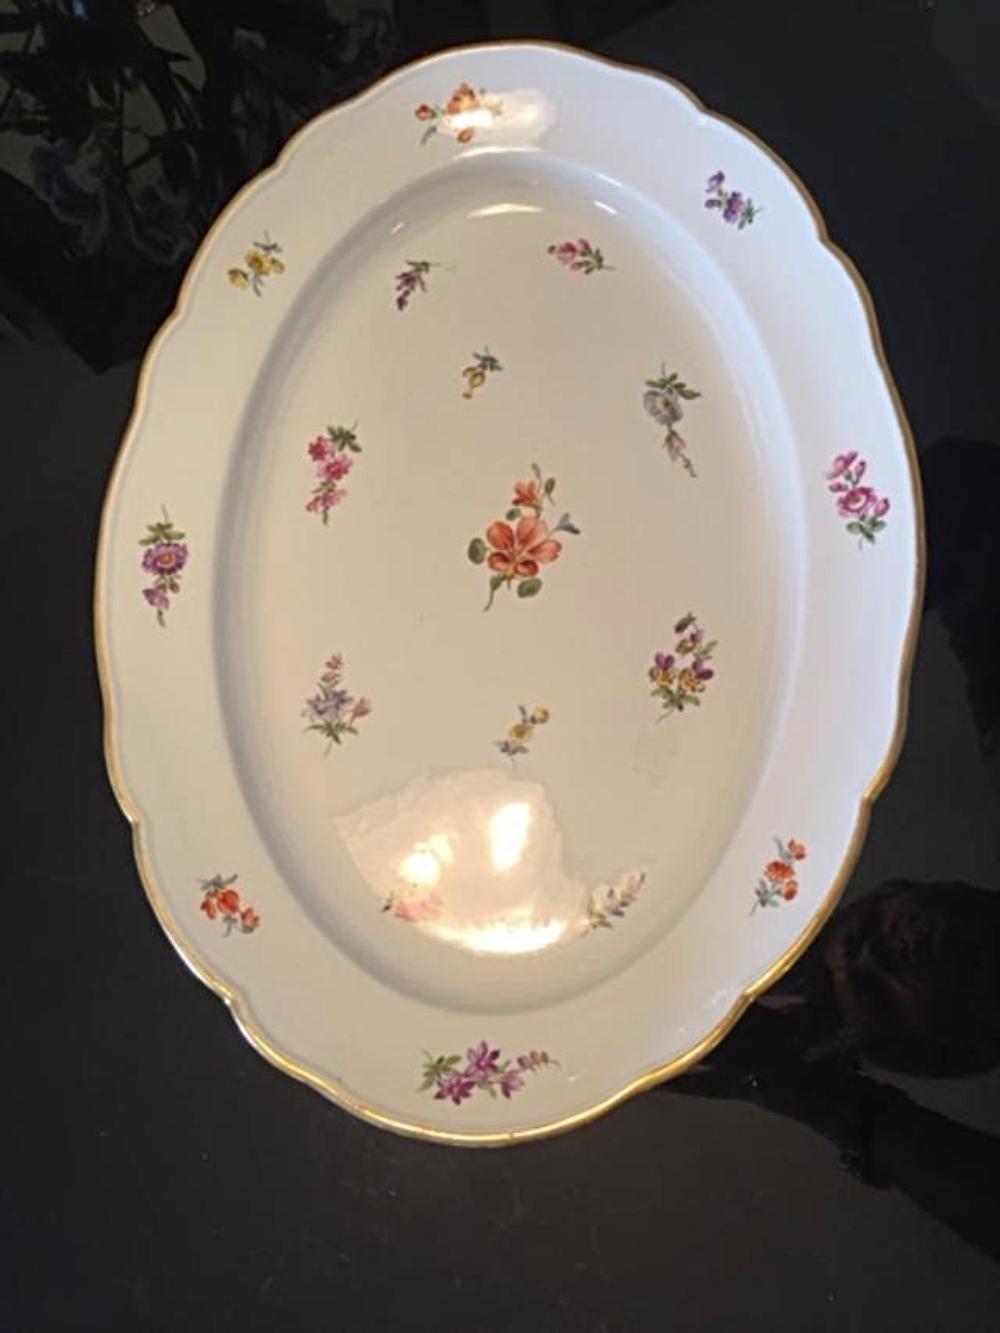 Lot 35: Large Antique MEISSEN Serving Tray Platter Dish Plate